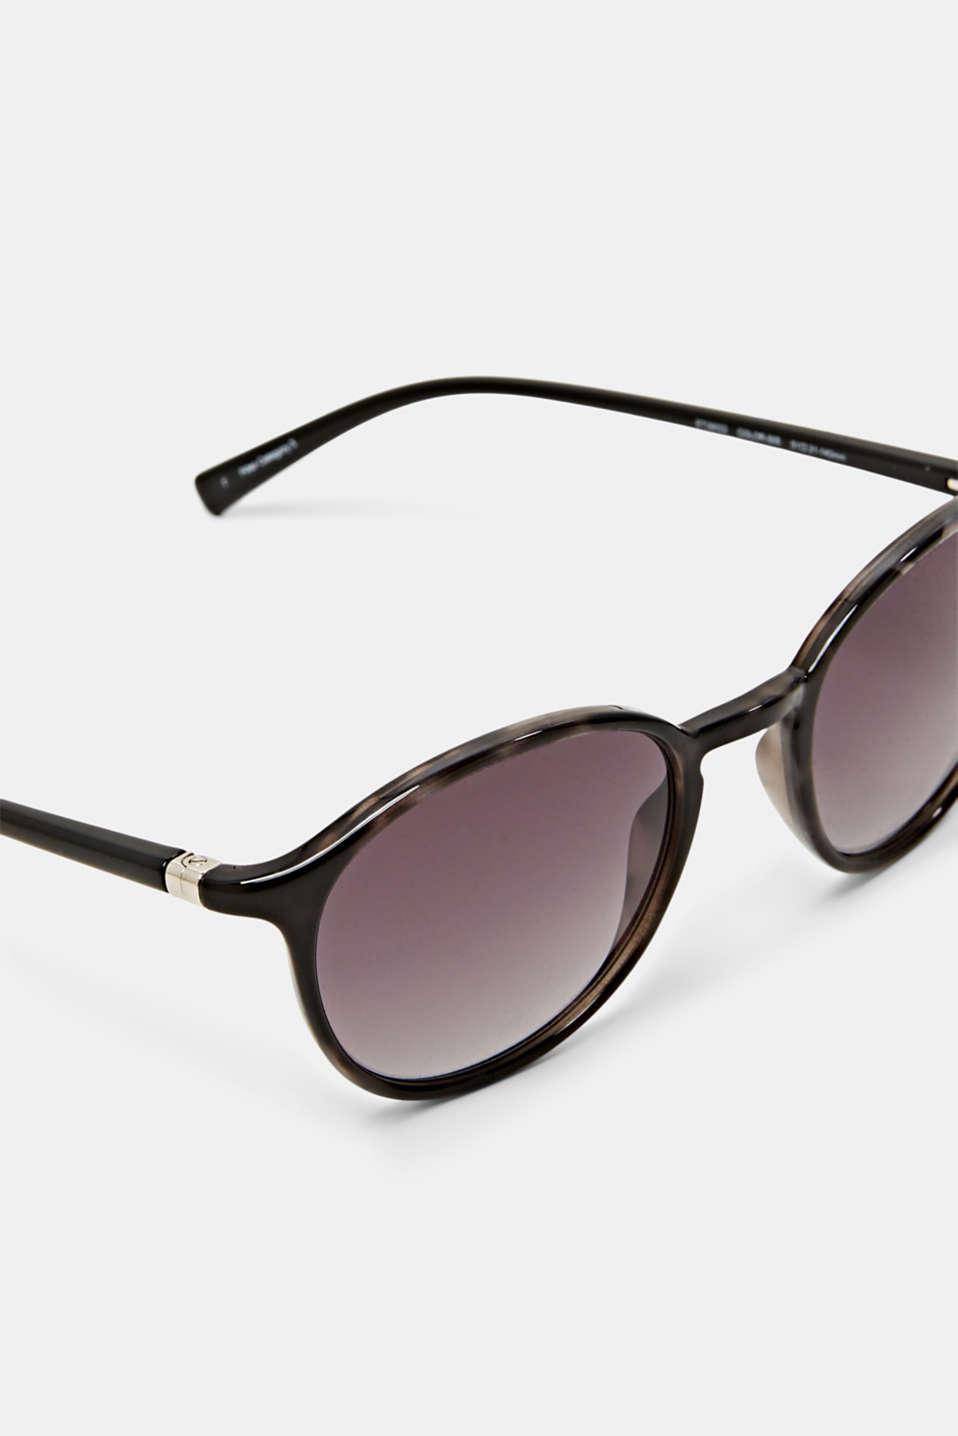 Unisex vintage sunglasses, GREY, detail image number 1